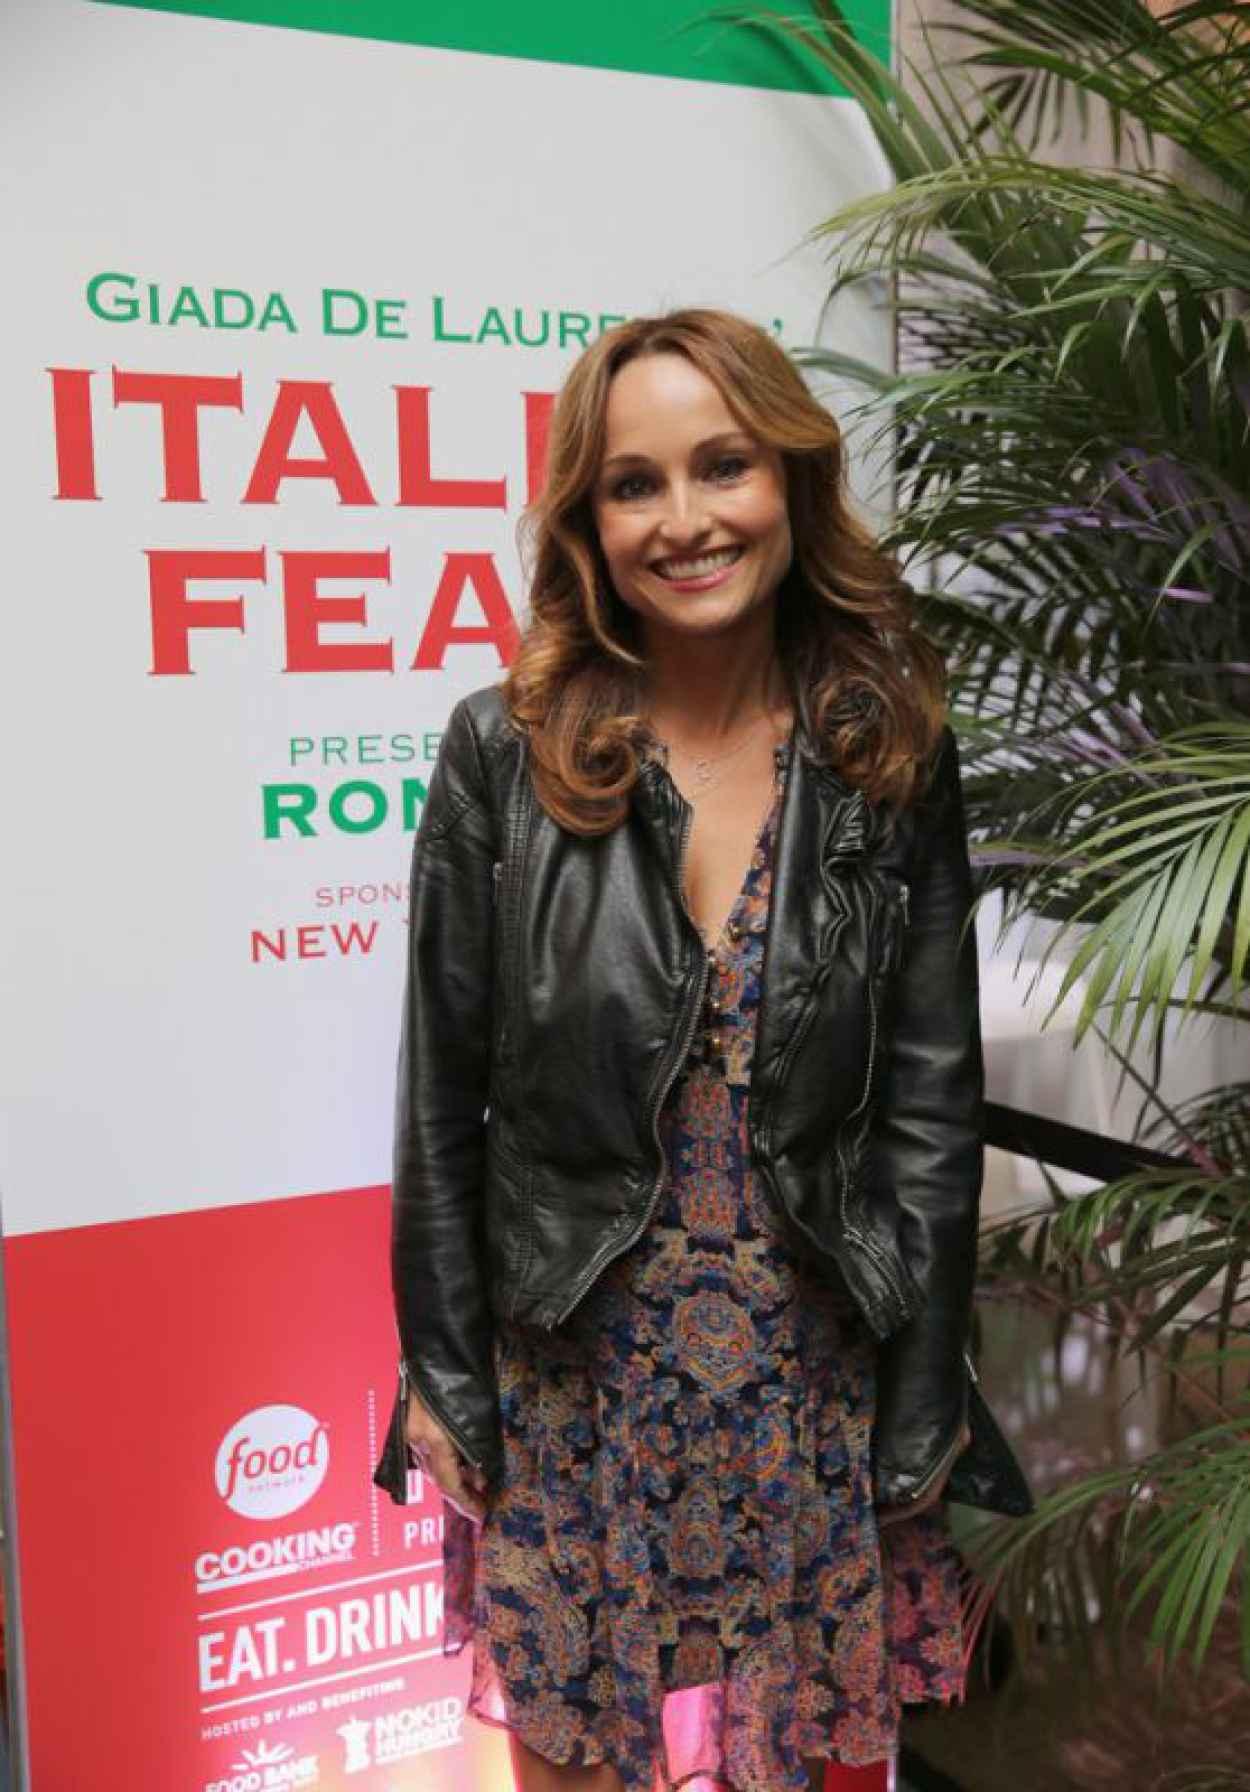 Giada De Laurentiis - Giada De Laurentiis Italian Feast Presented by Ronzon in NYC-1